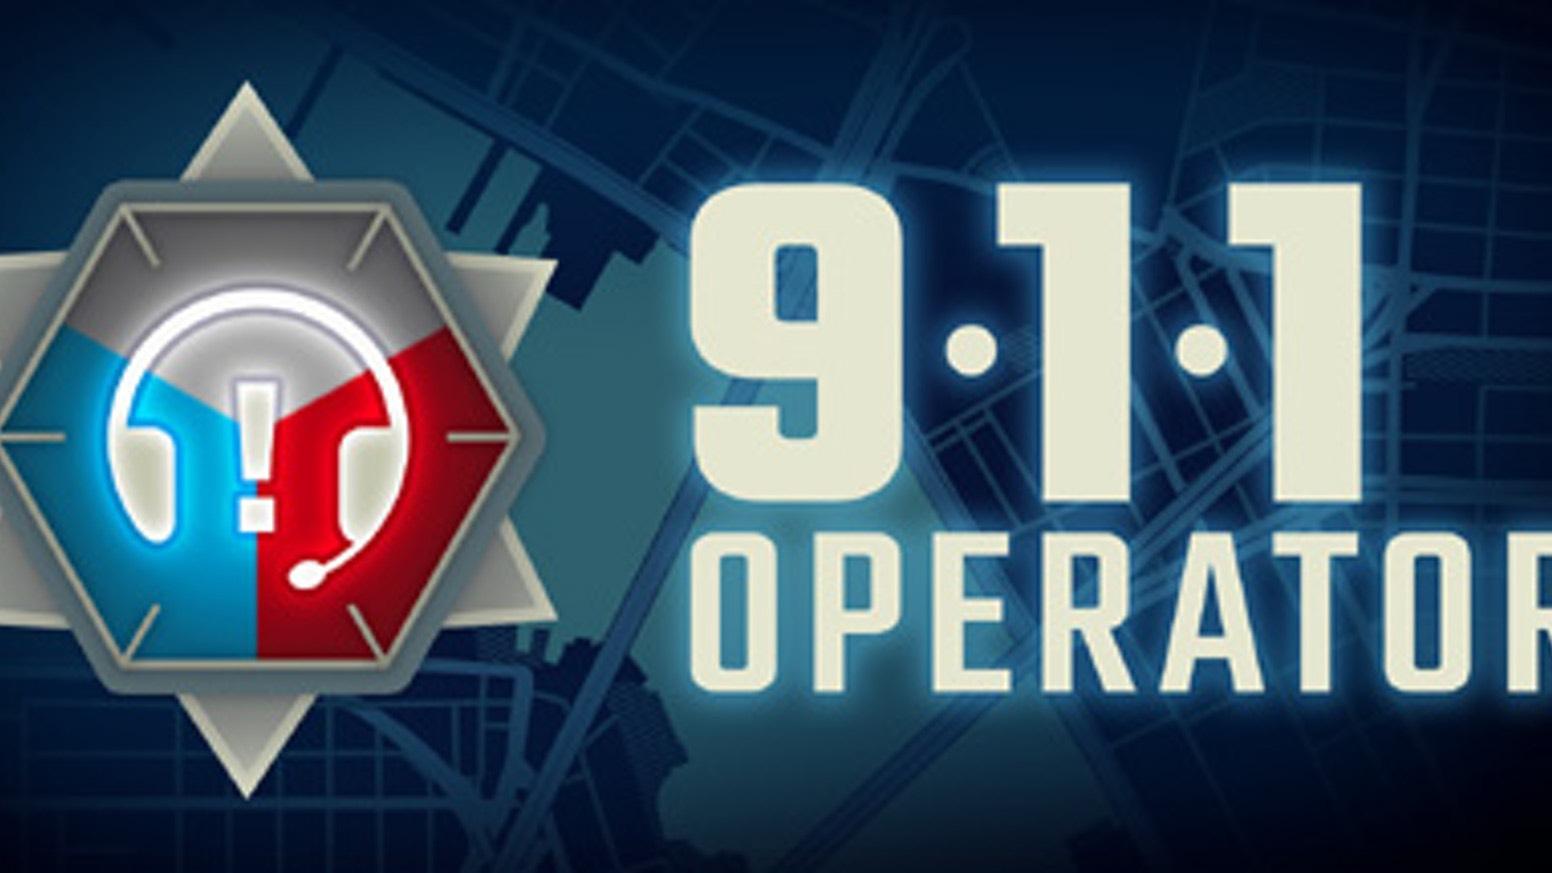 911 Operator for Nintendo Switch 89p @ Nintendo Store